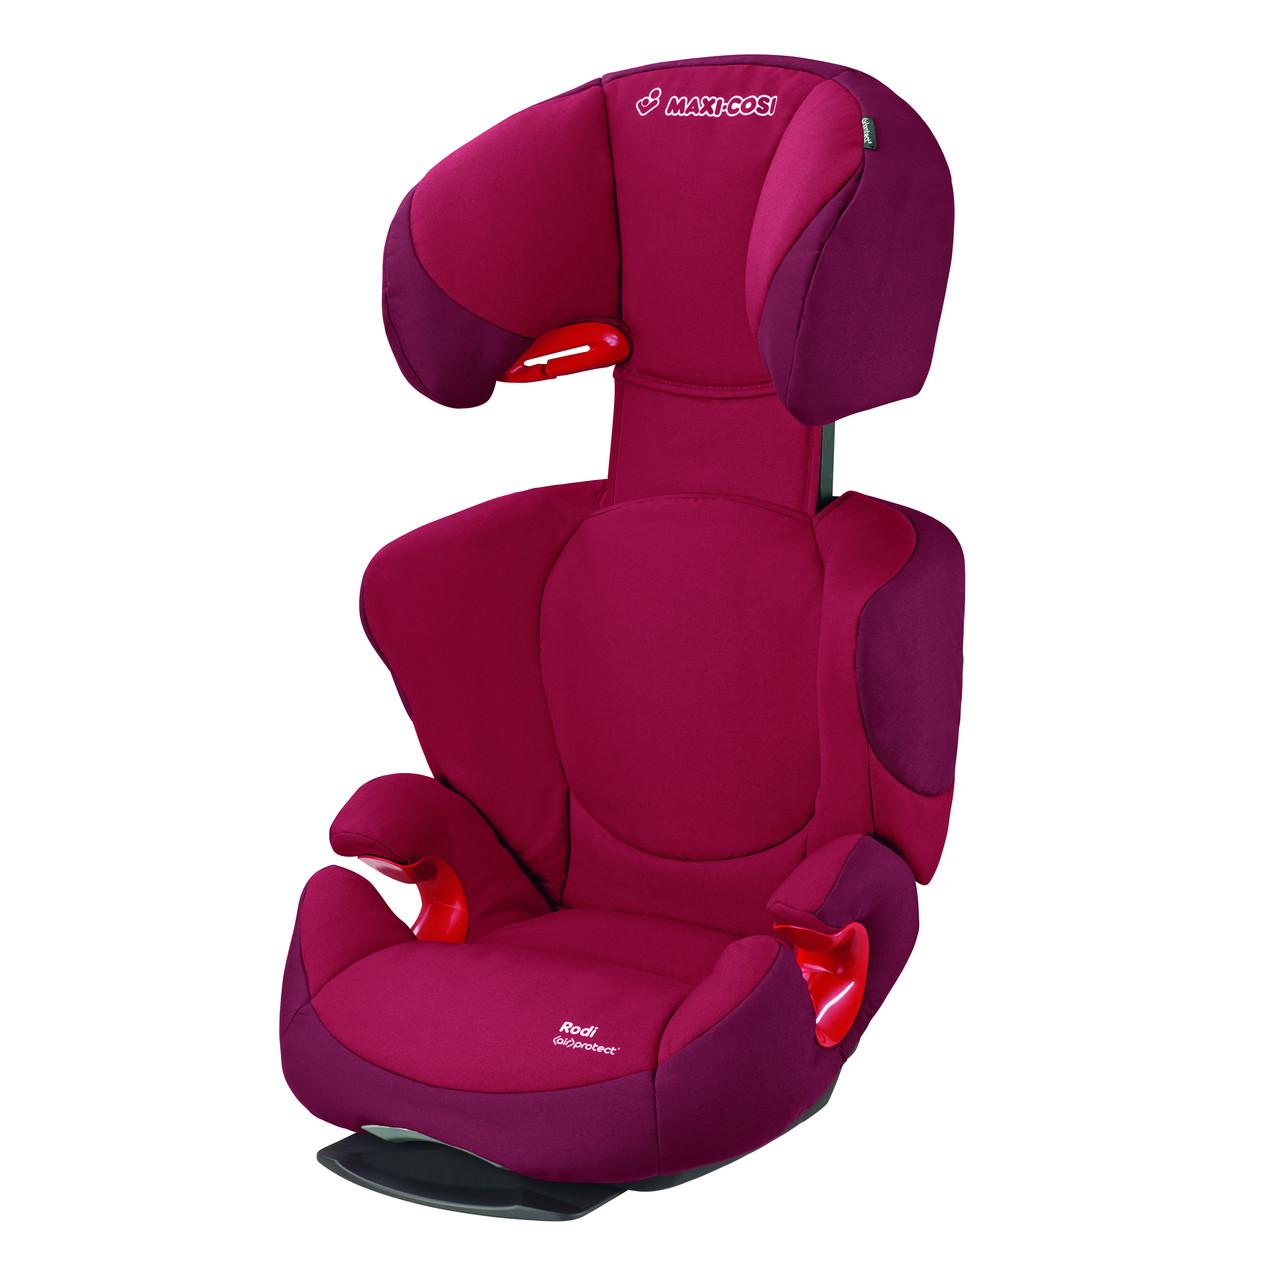 Автокресло Maxi Cosi Rodi AP 15-36 кг (75108990) Robin Red (тёмно-красный)